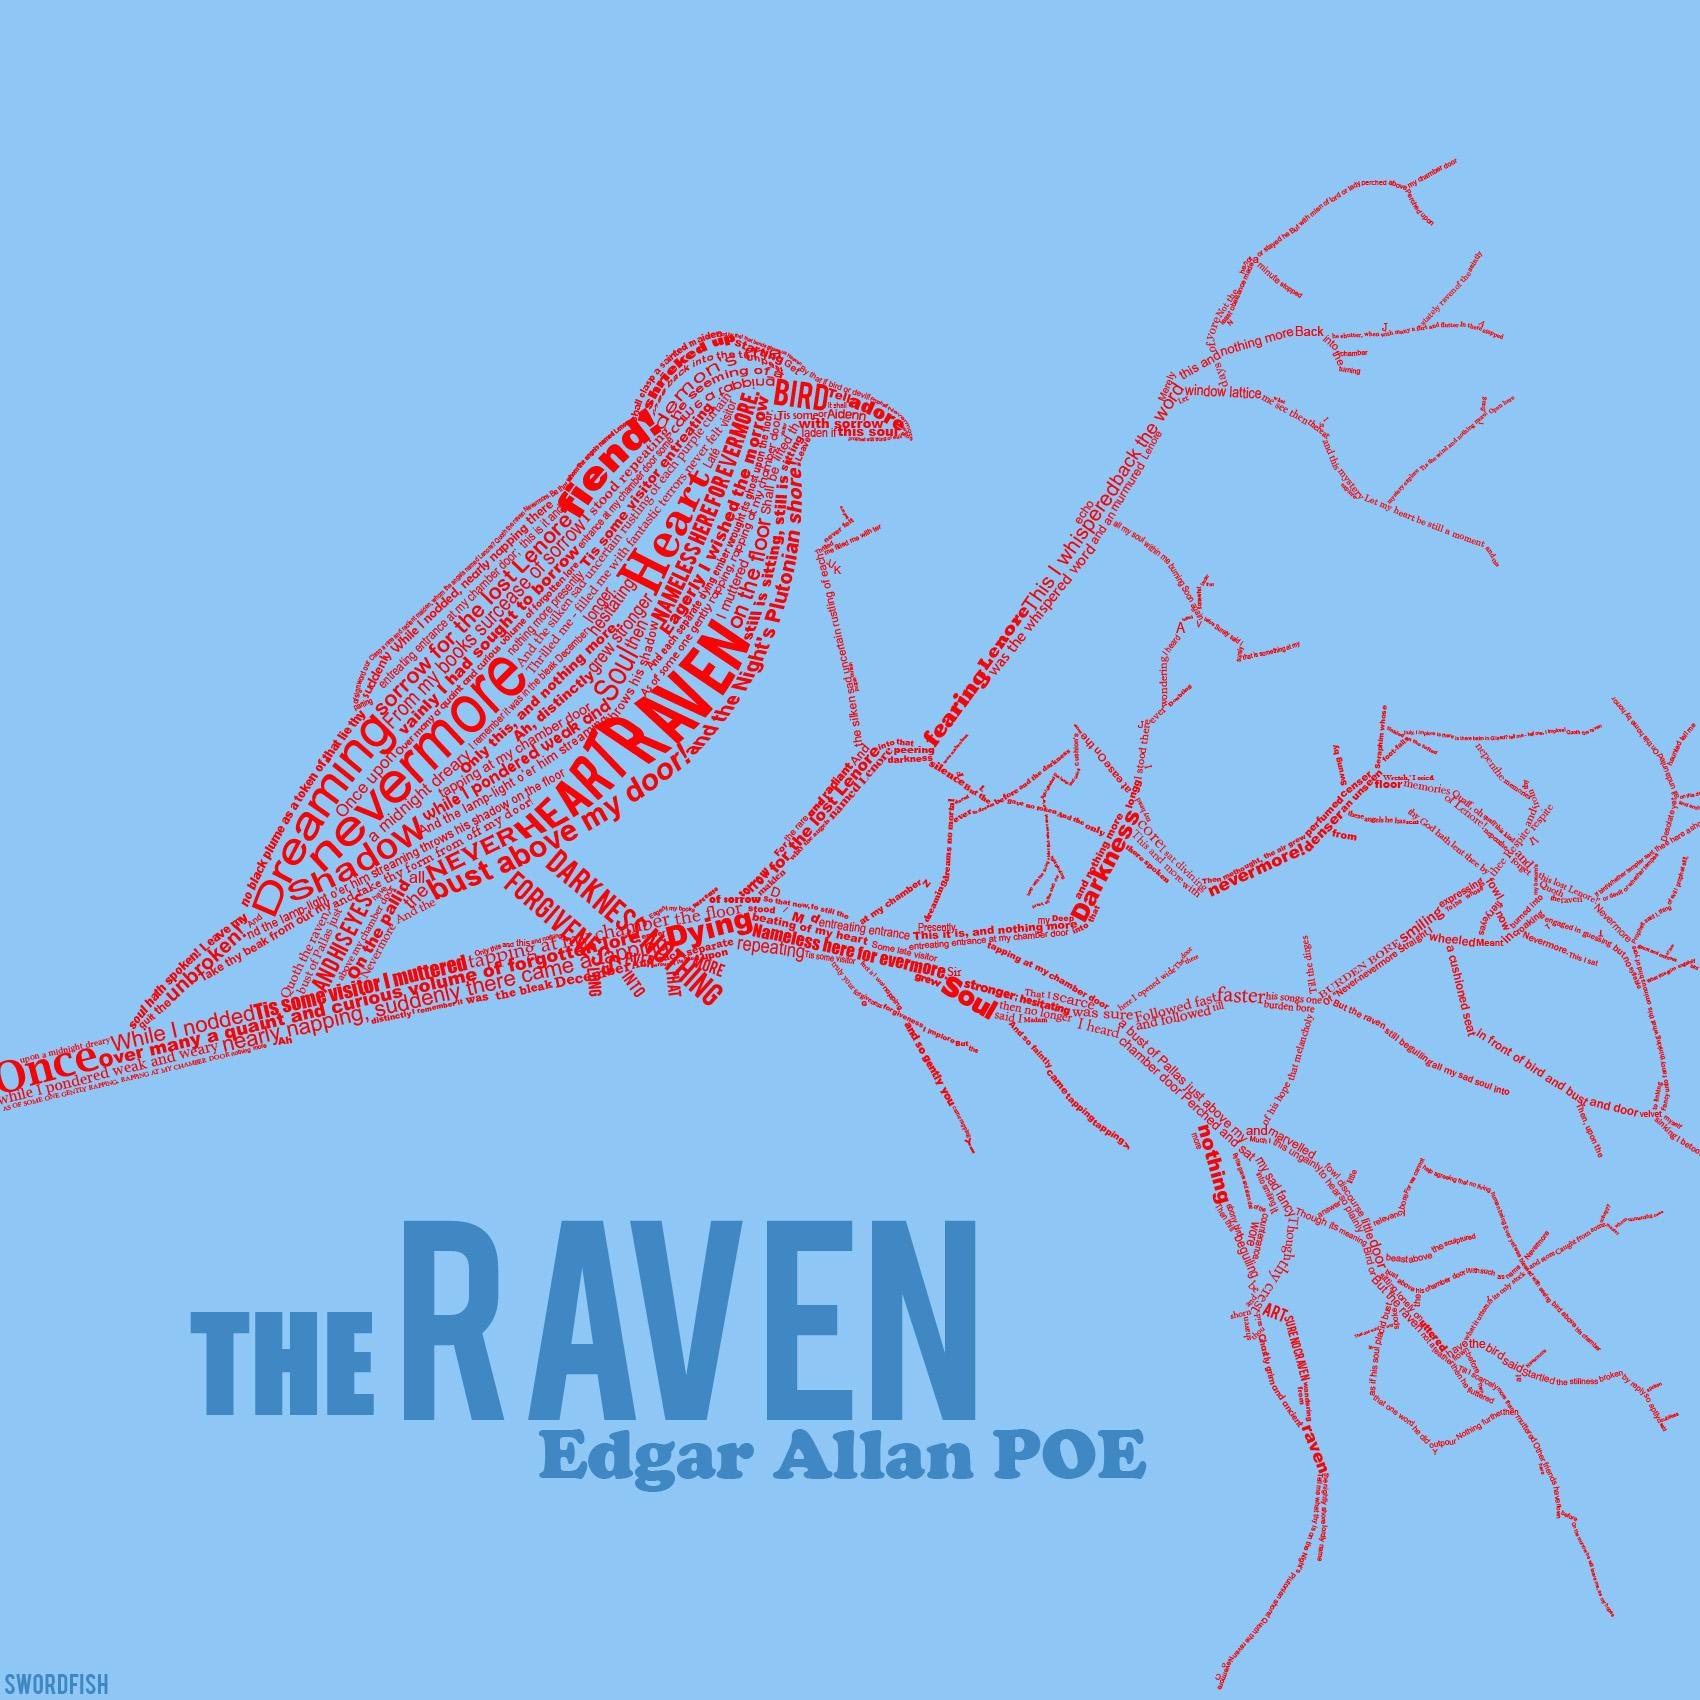 edgar allan poe thesis statement on the raven